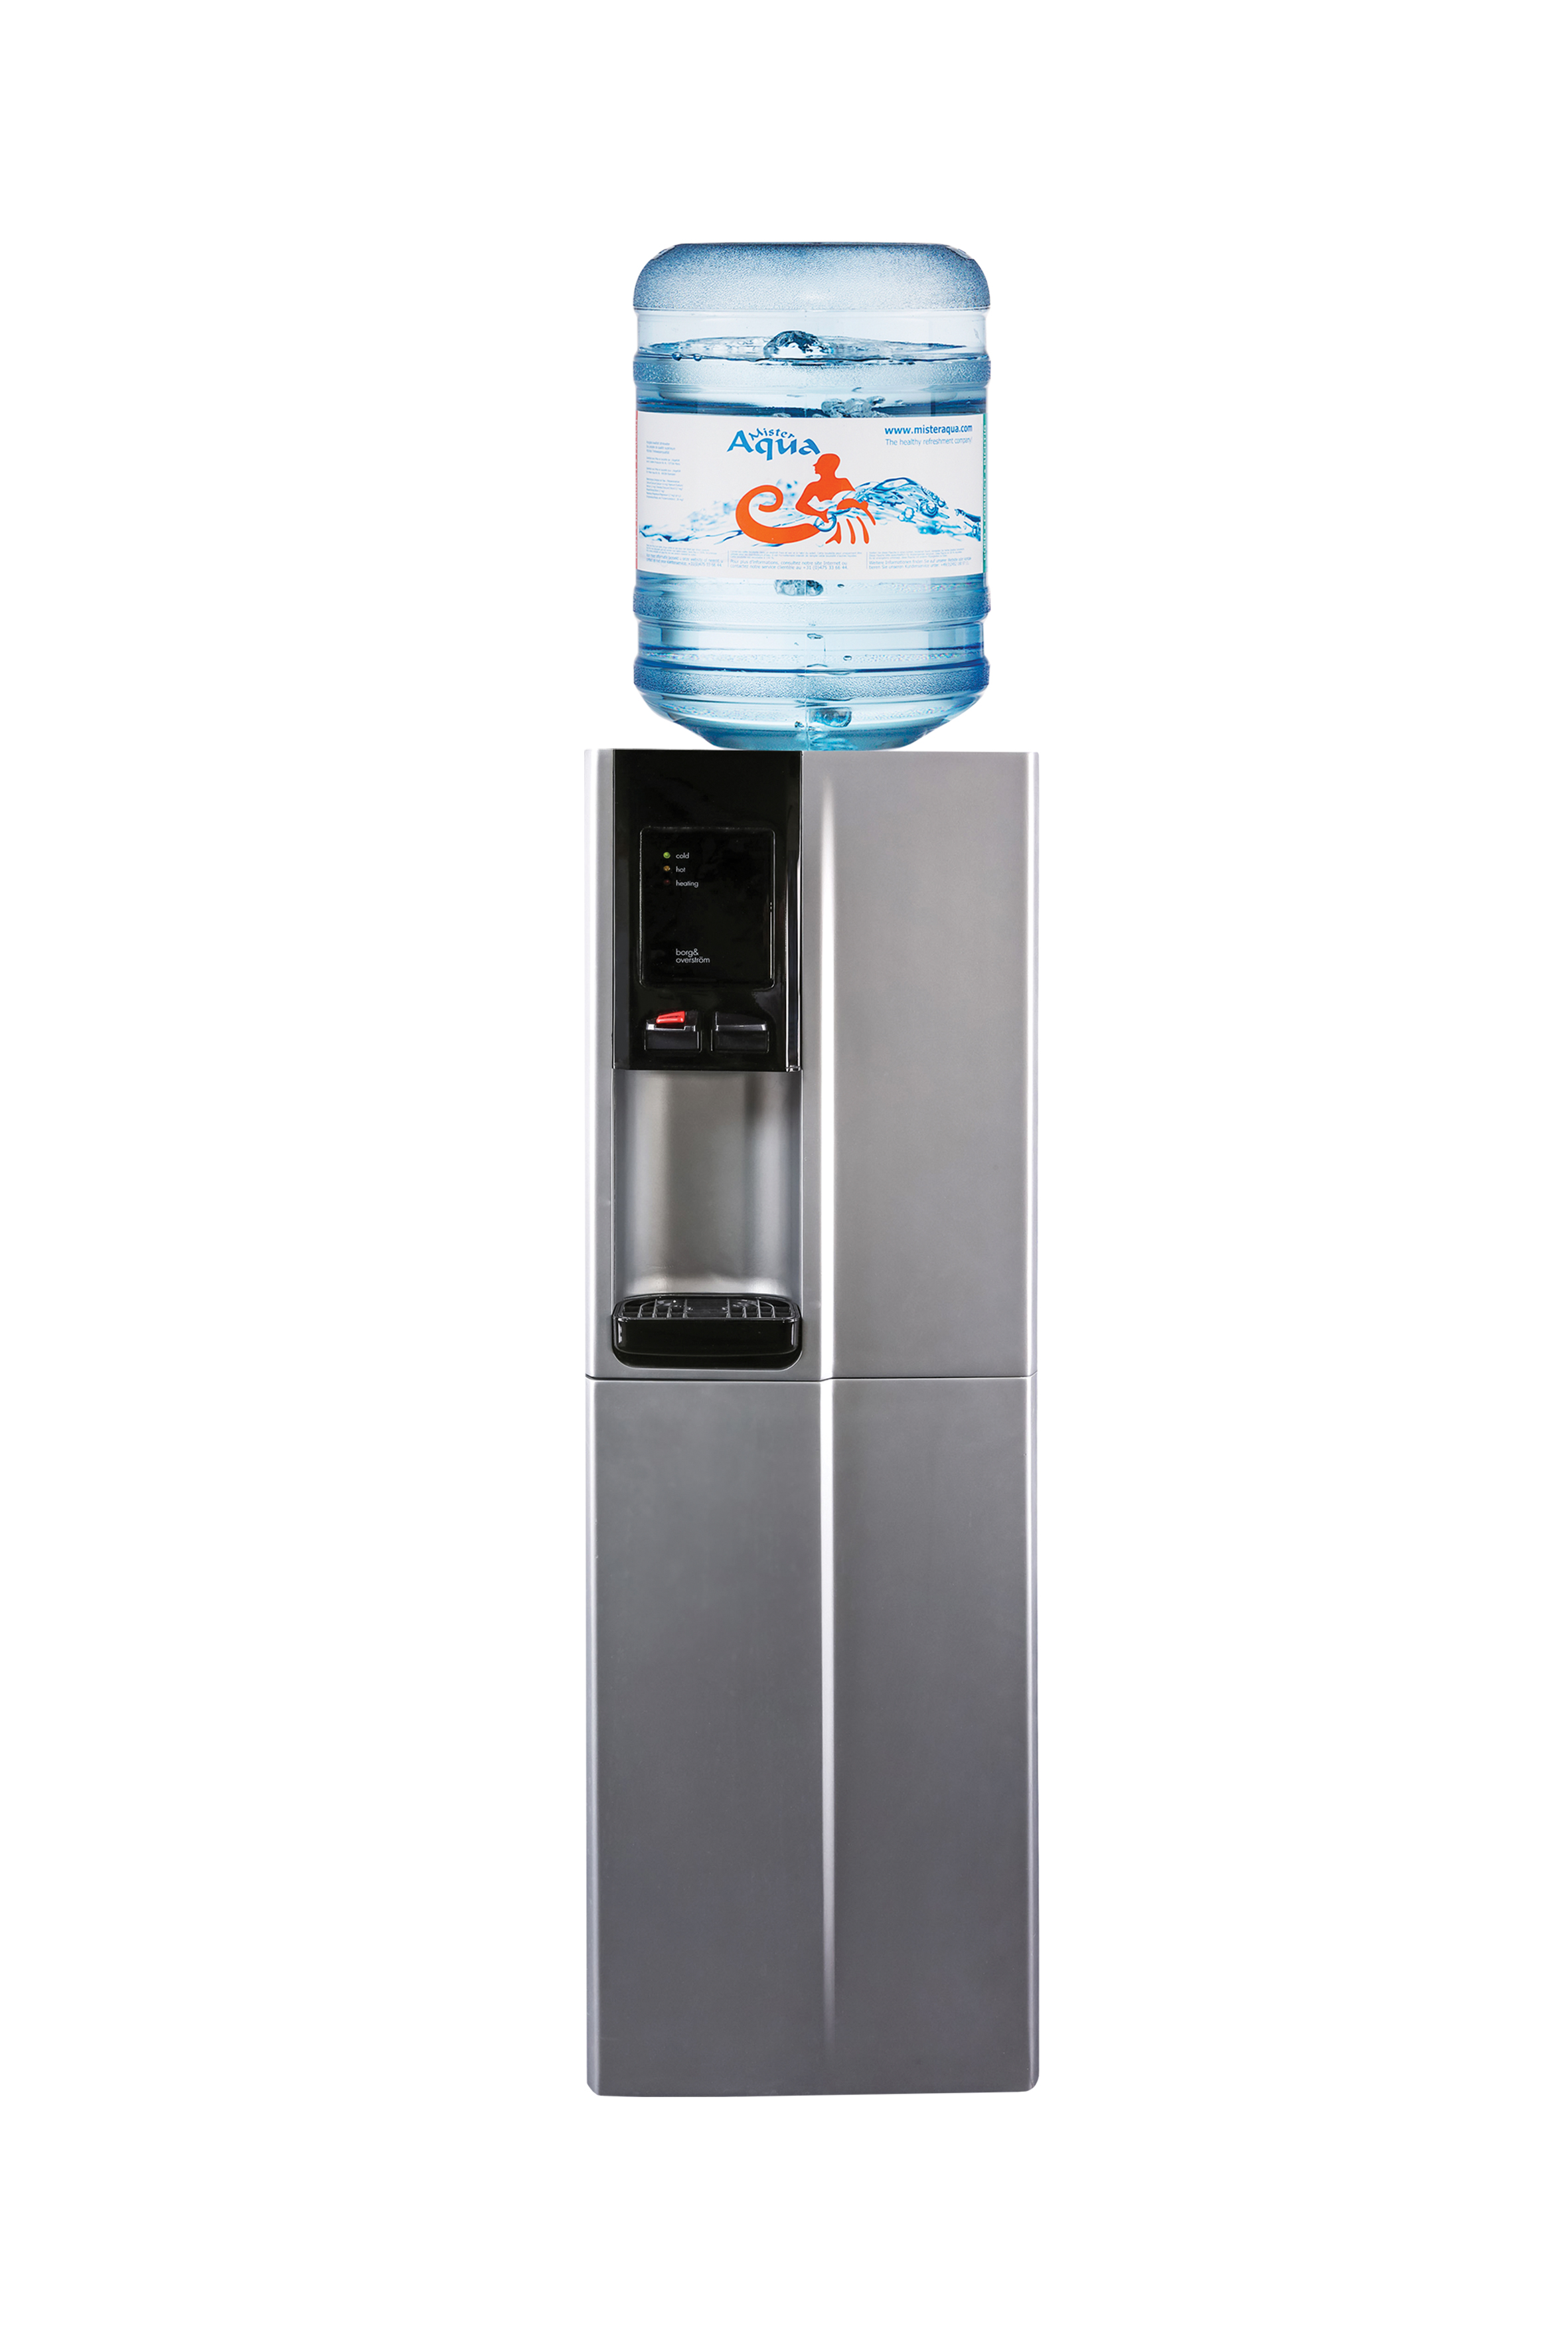 B2 flessenwatercooler